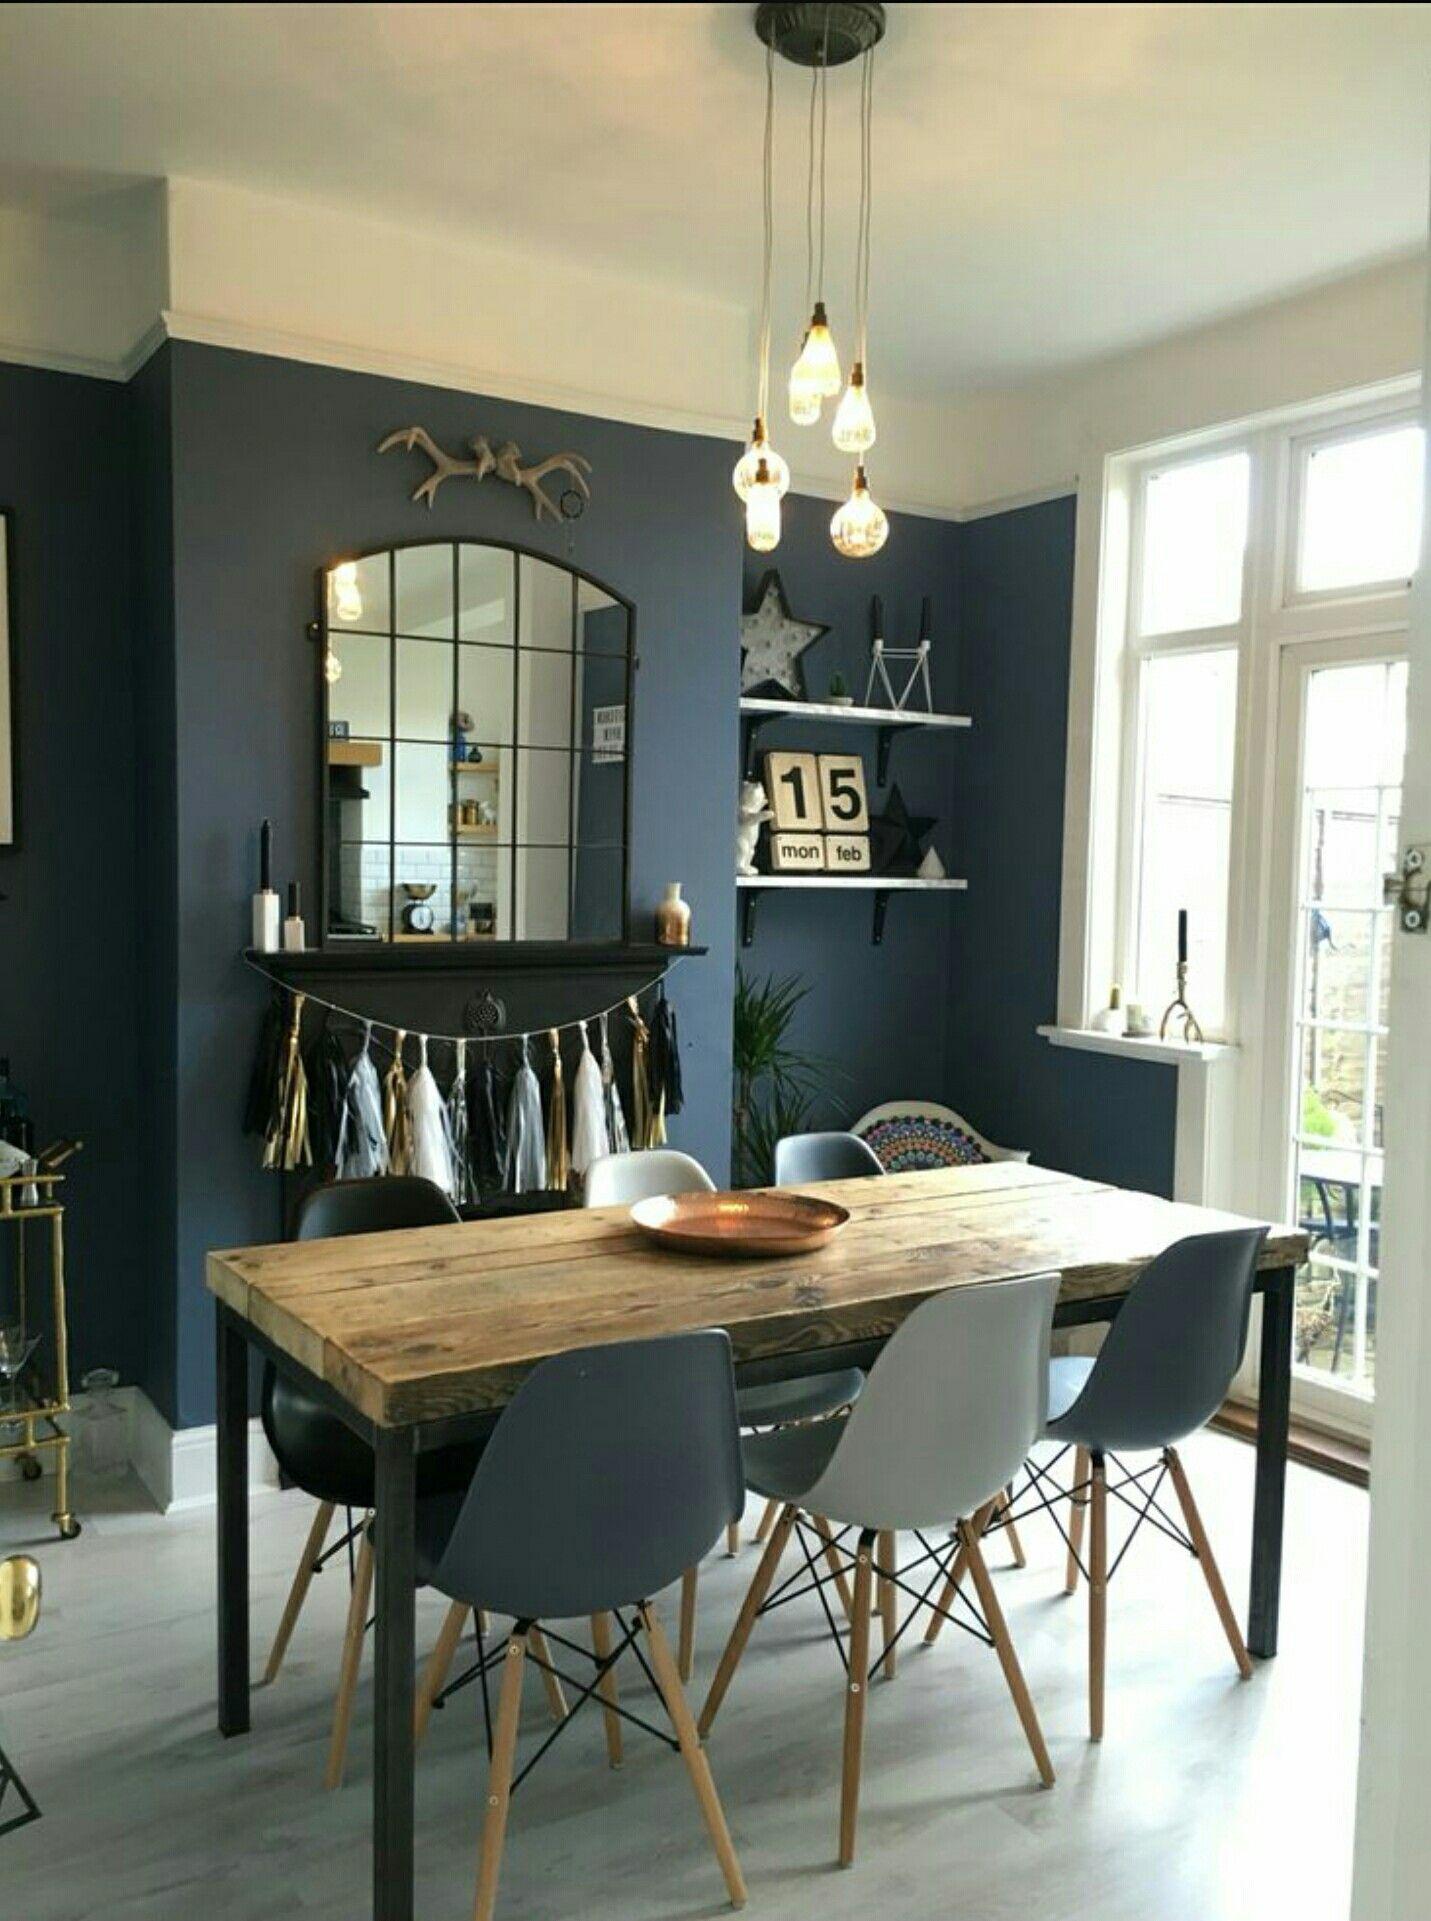 Pin di Helen Rock su kitchen extension | Pinterest